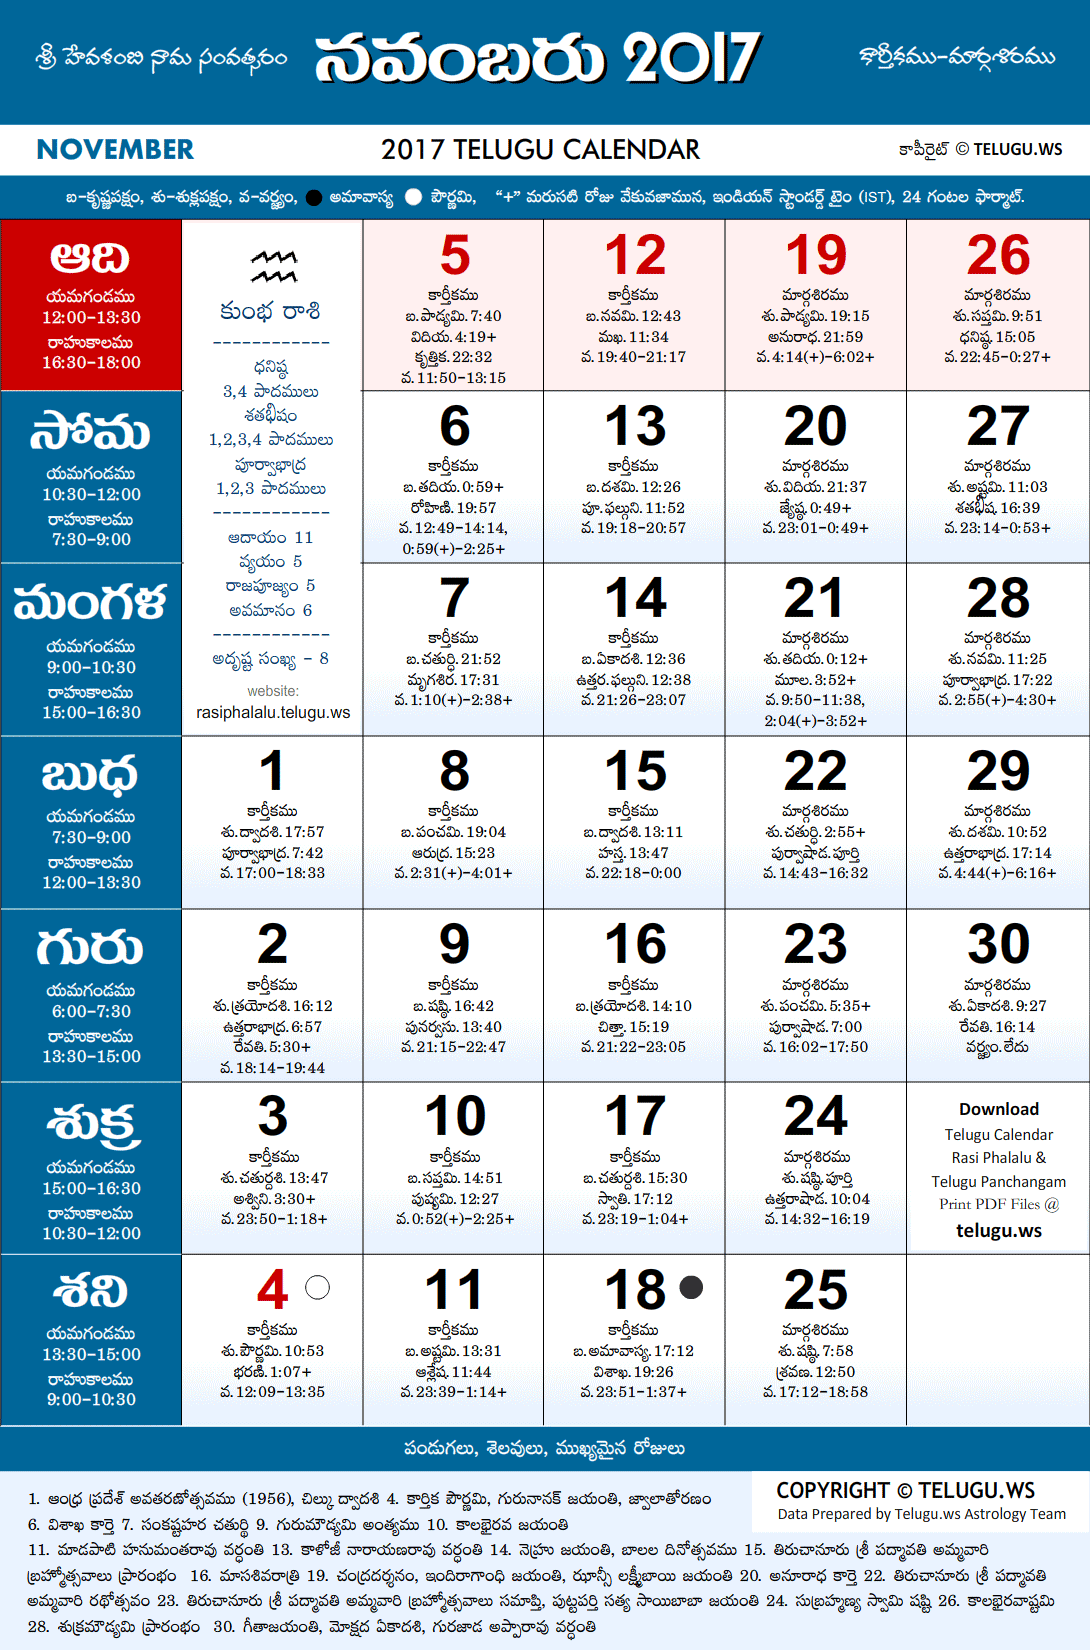 Telugu Calendar 2017 November PDF Print with Festivals & Holidays List